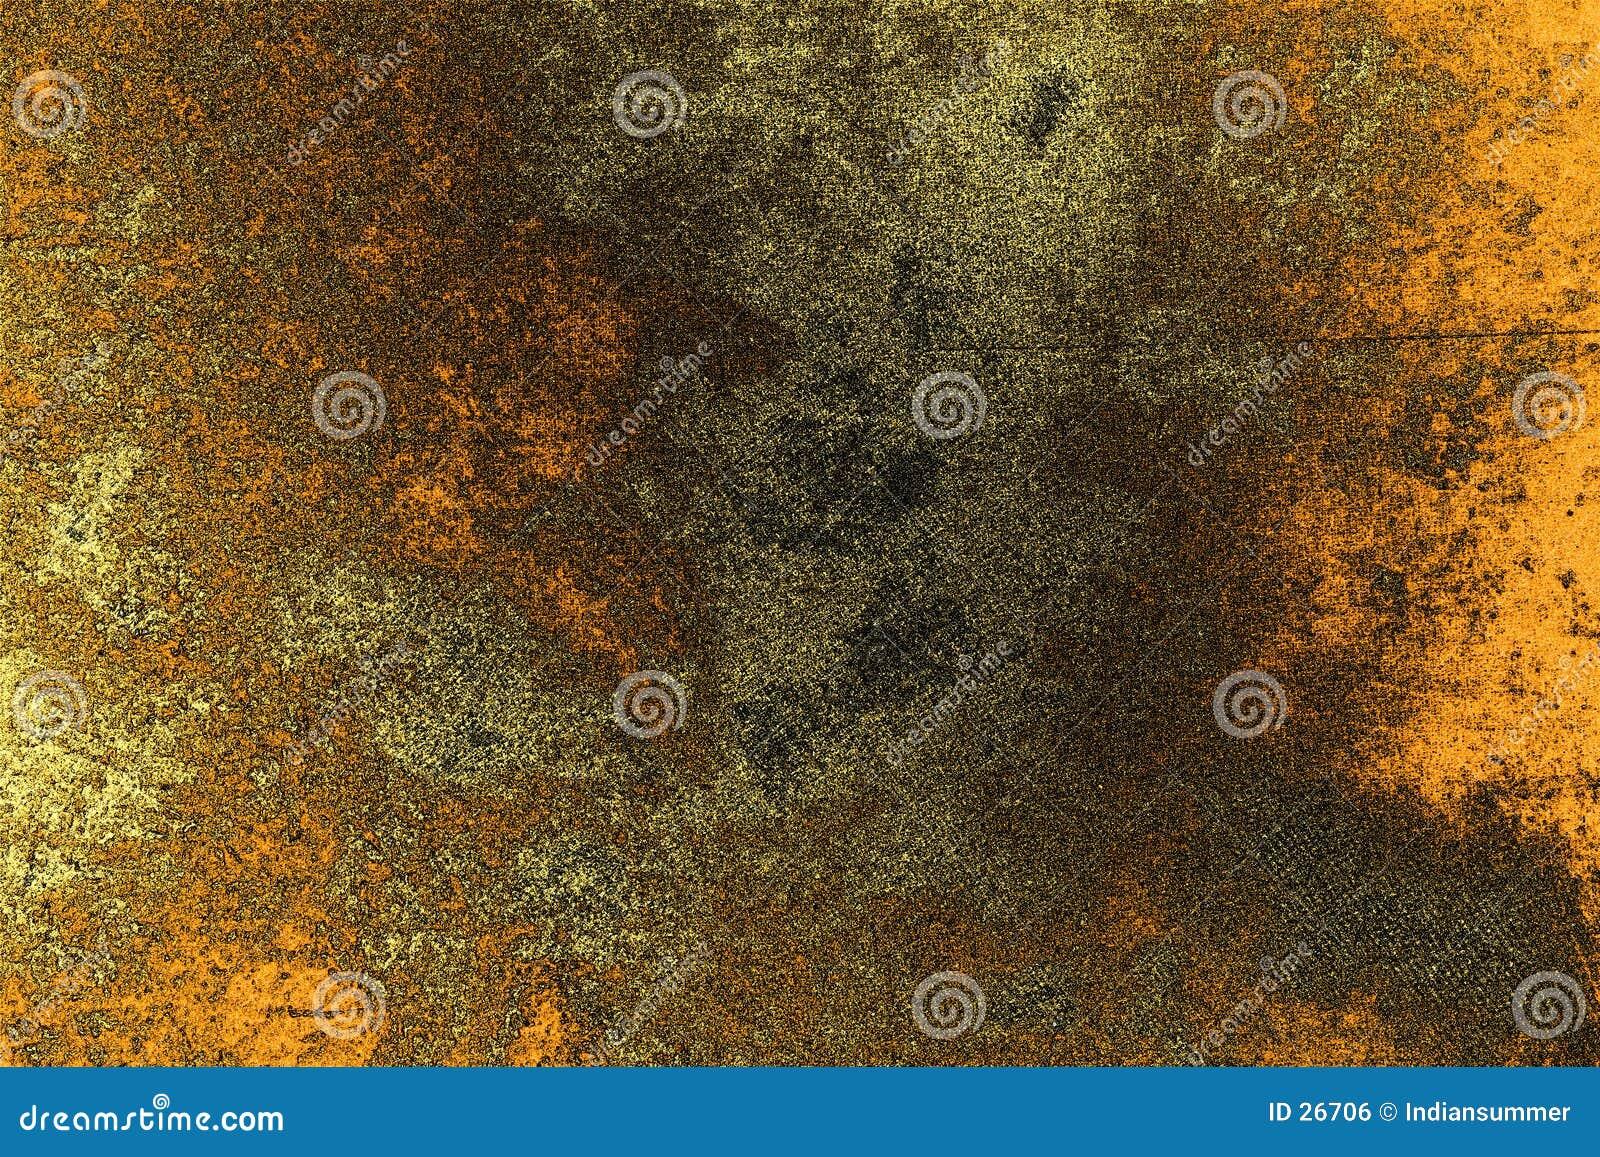 Textura realmente oxidada & suja